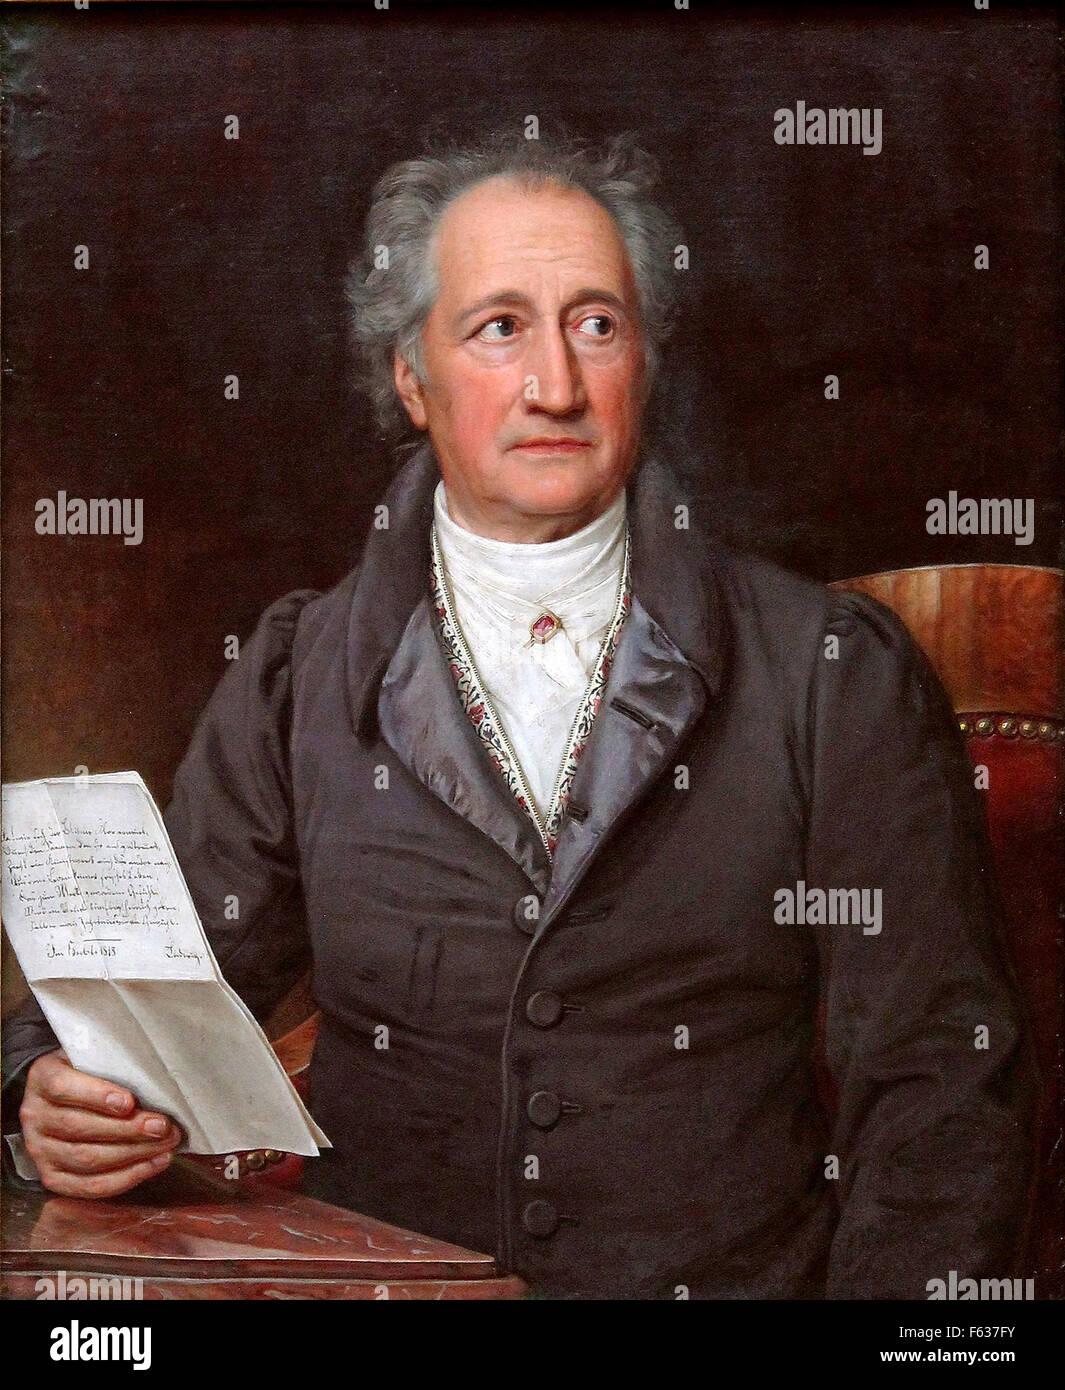 Johann Wolfgang von Goethe, German writer and statesman. - Stock Image